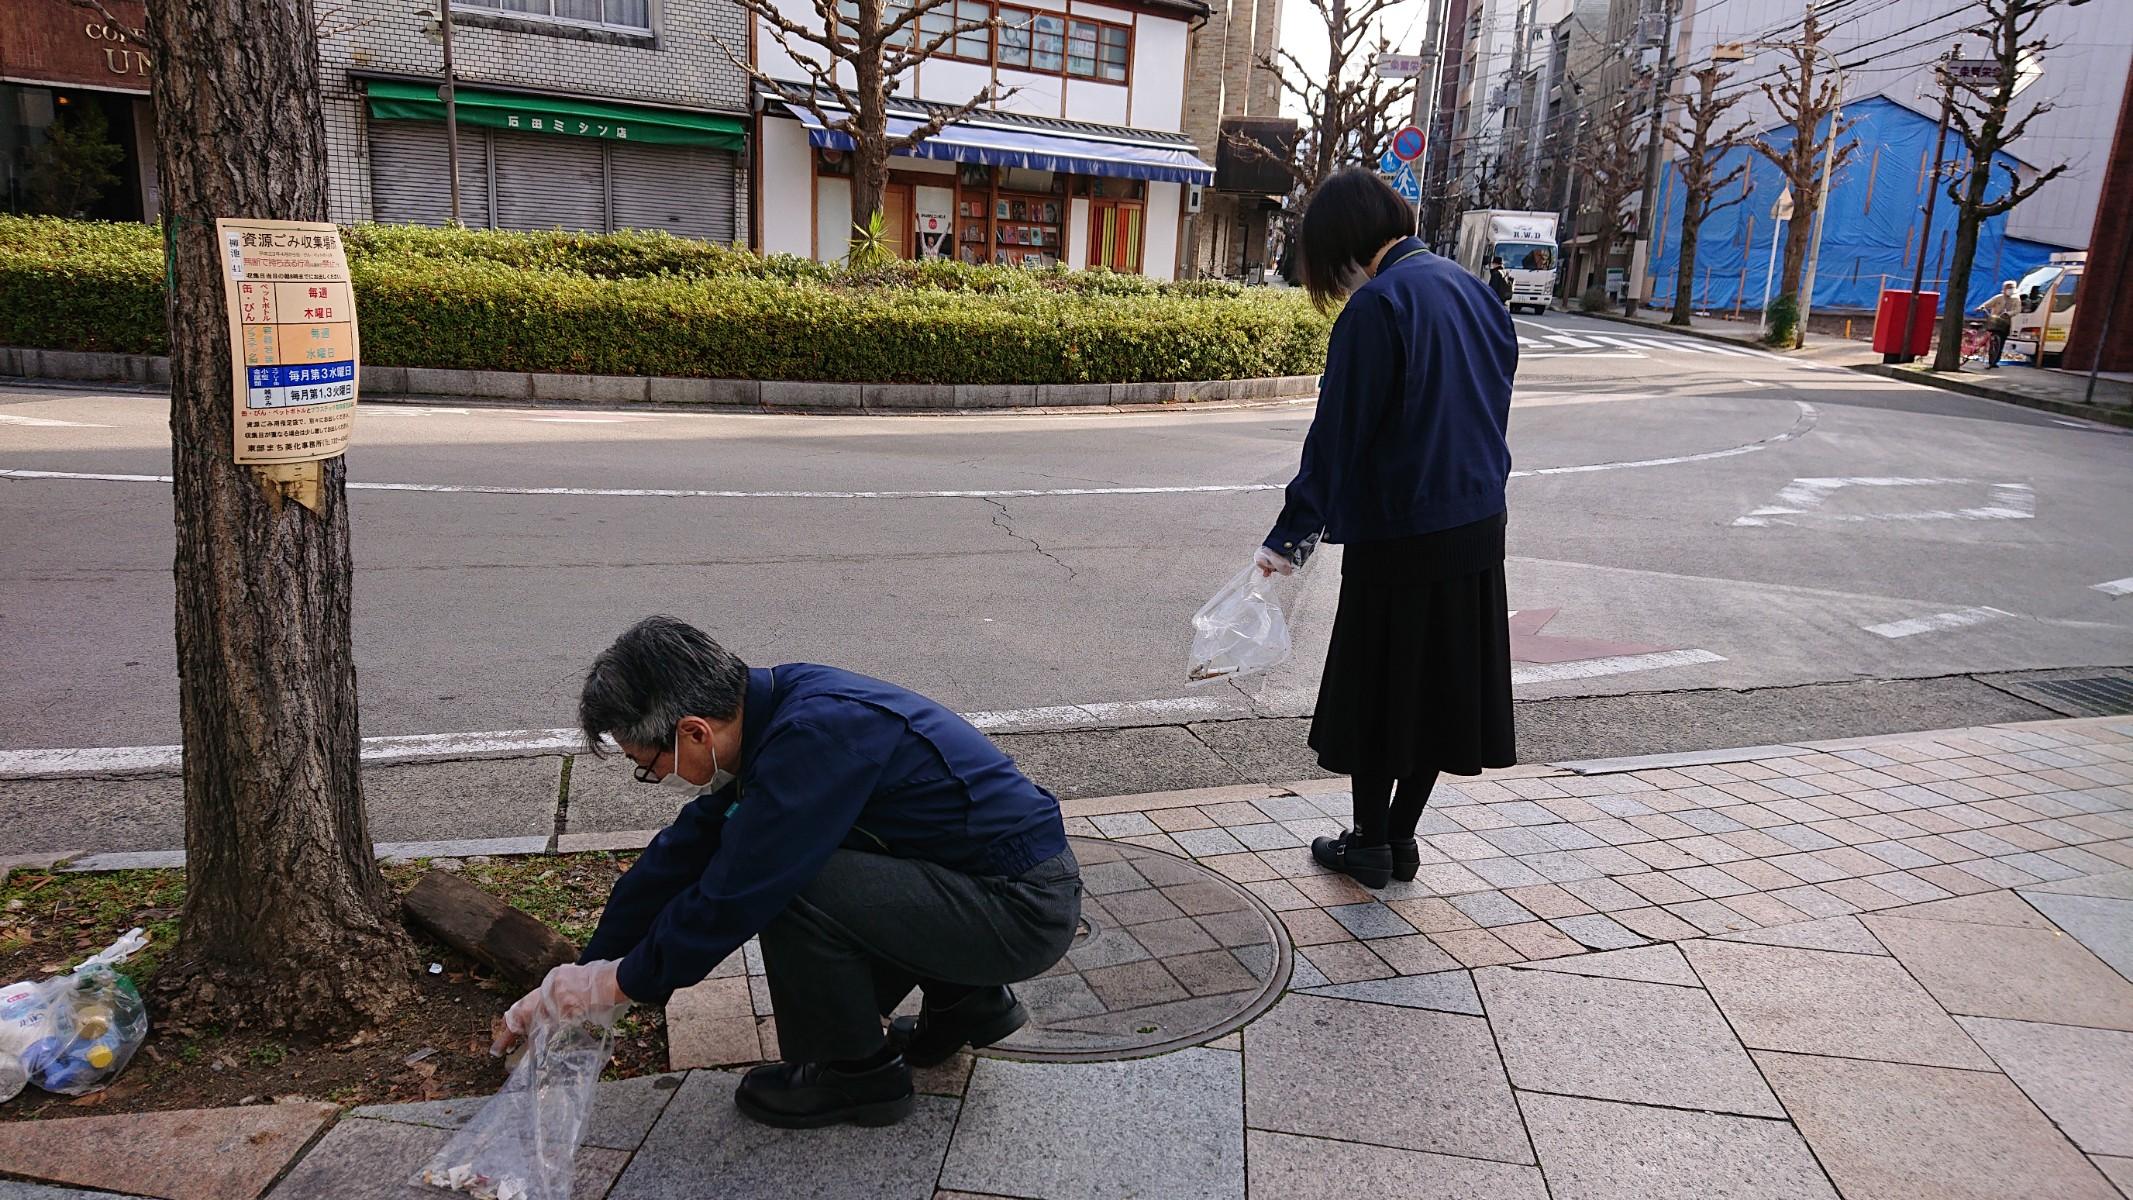 Photo_21-01-26-16-51-52.994.jpg